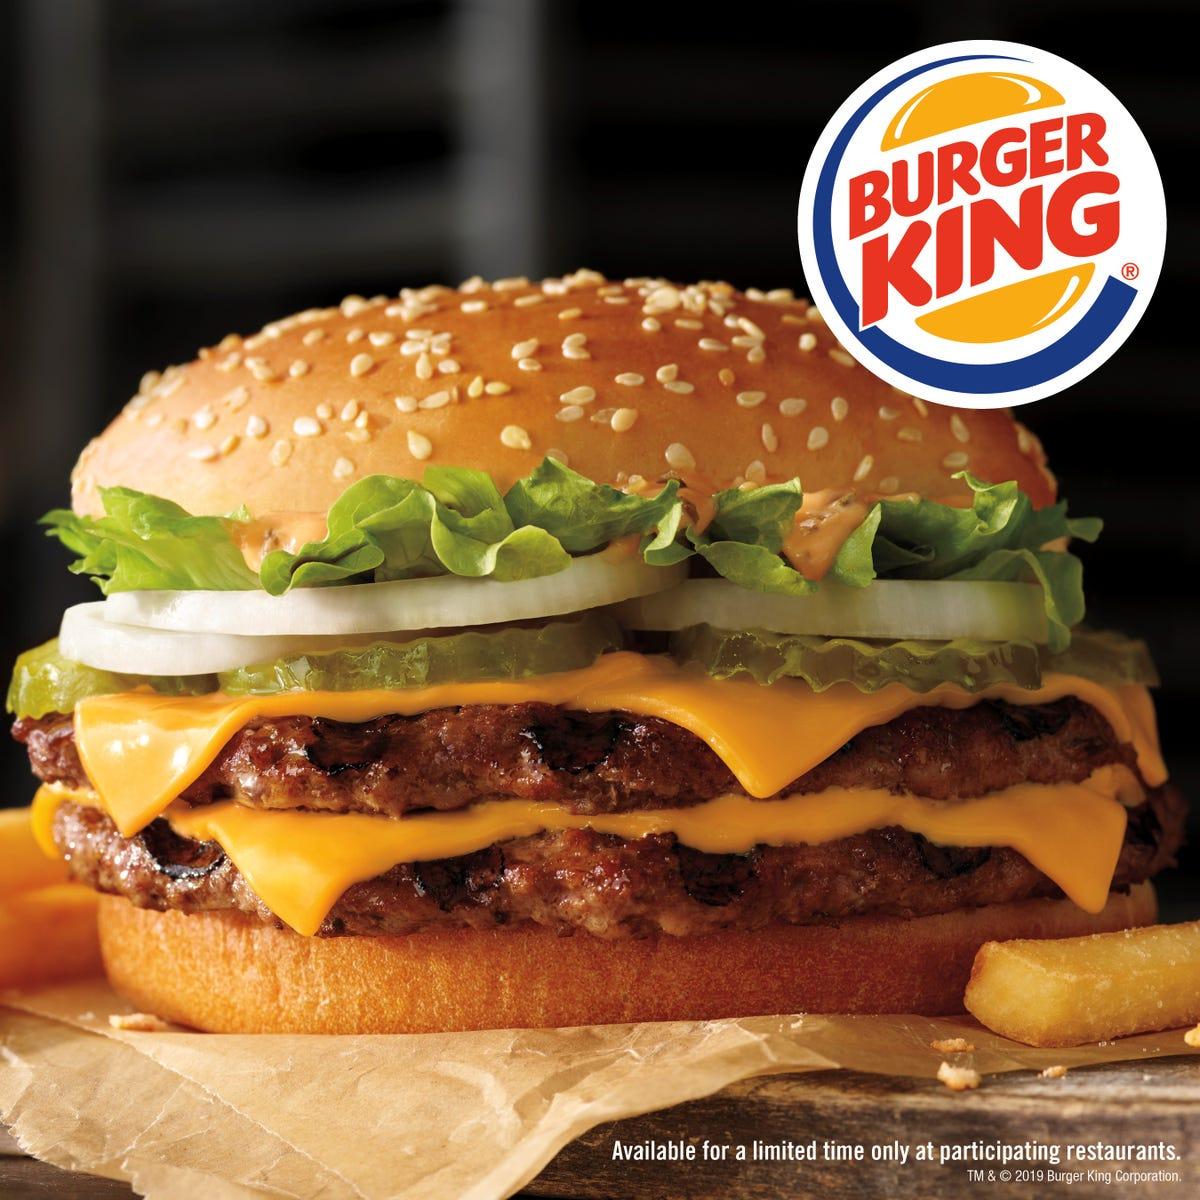 Burger King trolls McDonald's with new Big King XL sandwich